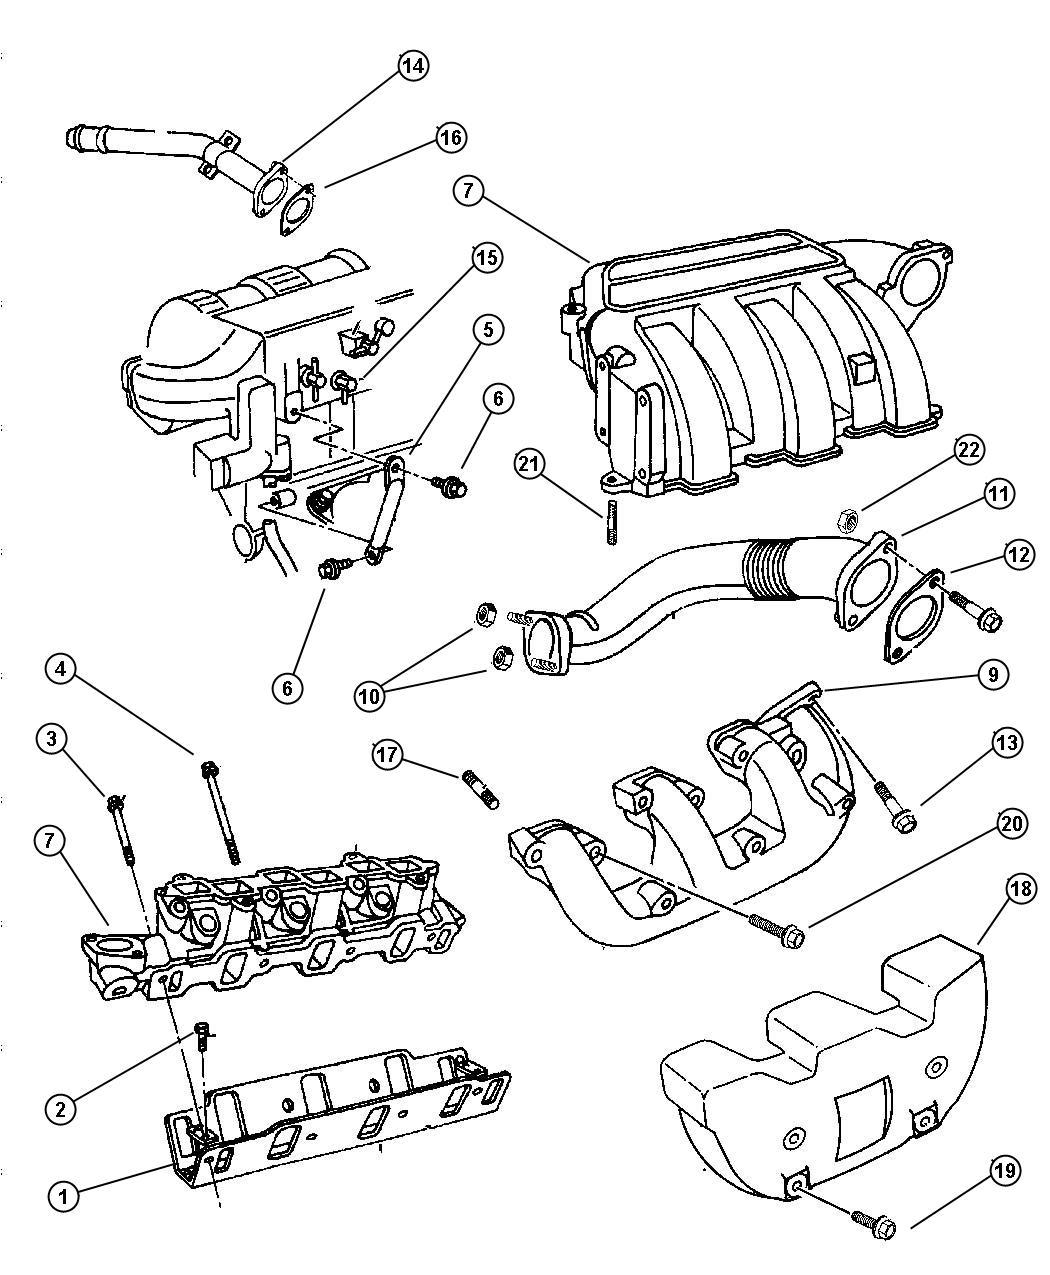 2000 Dodge Caravan Crossover. Exhaust manifold. Other